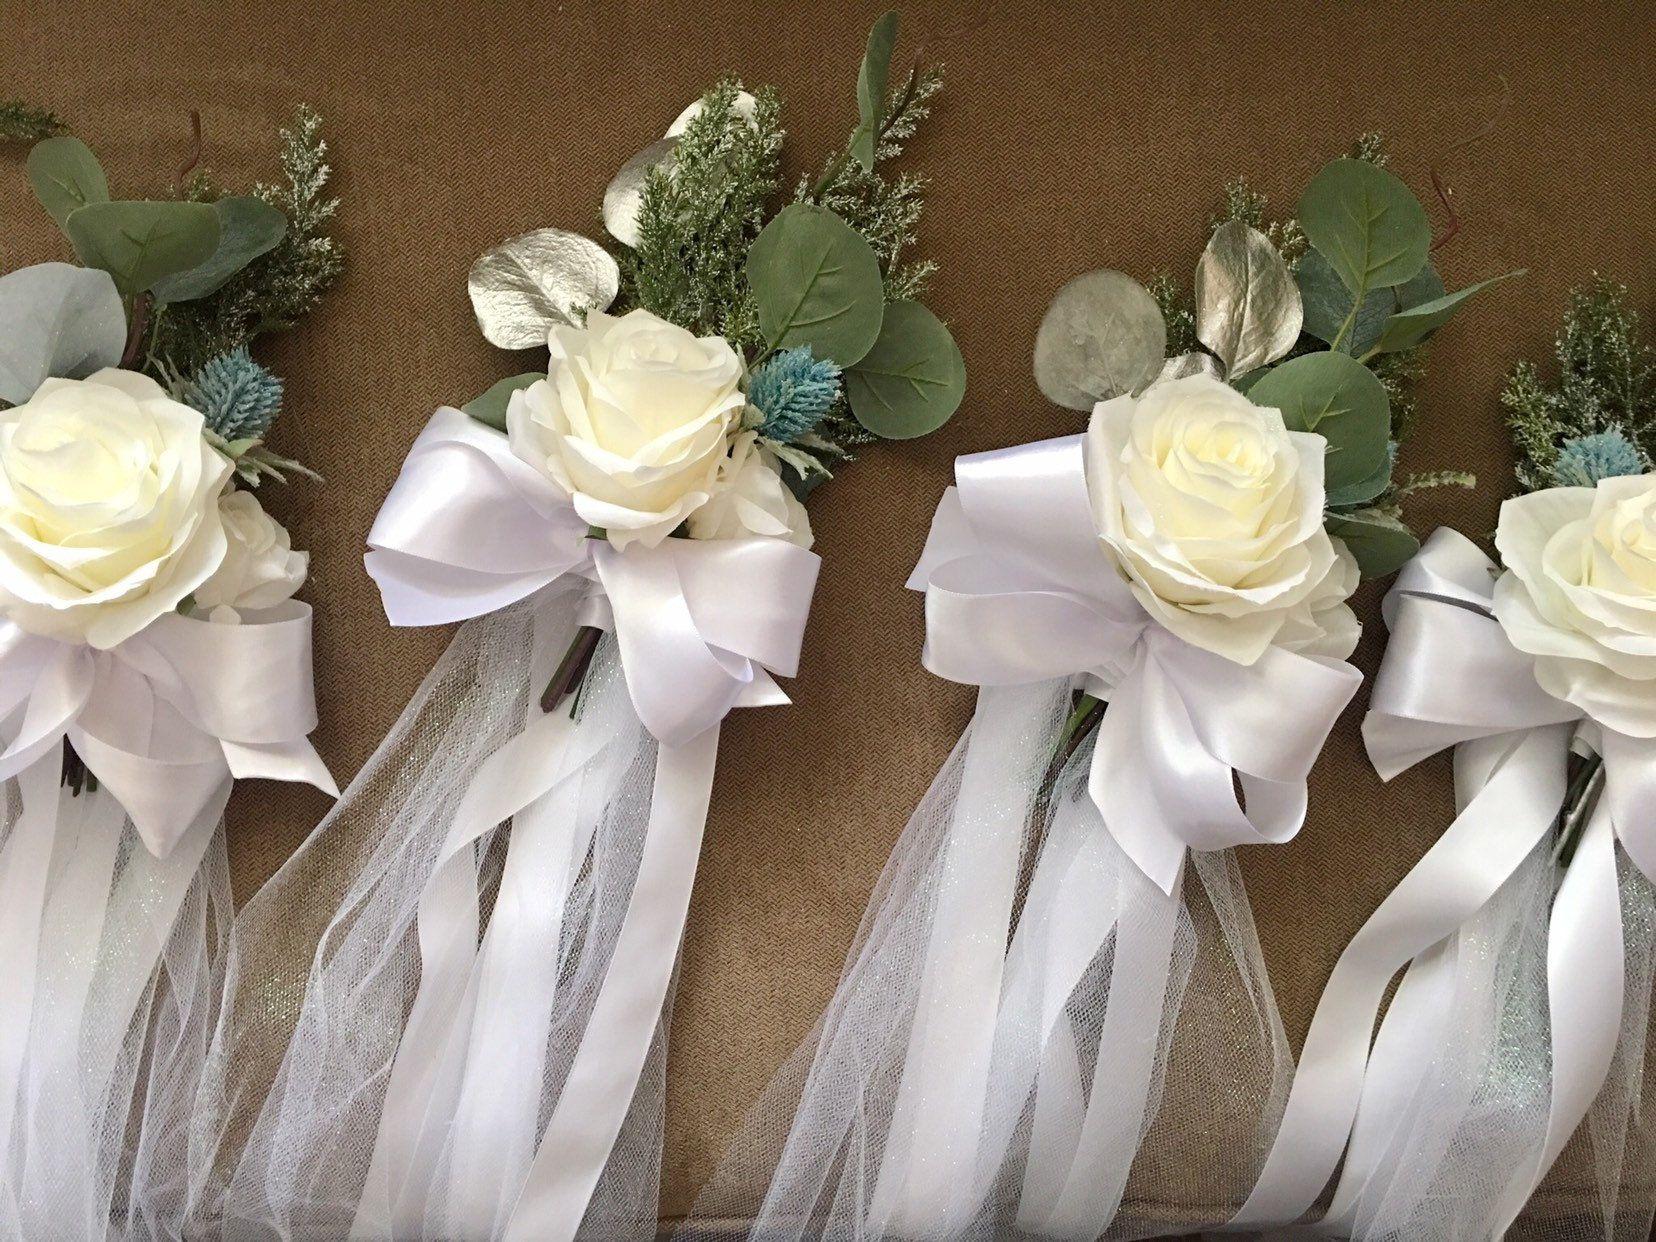 Bruiloft pouwt decoratie pew, winter bruiloft decoratie, kerk versiering. #decorationeglise